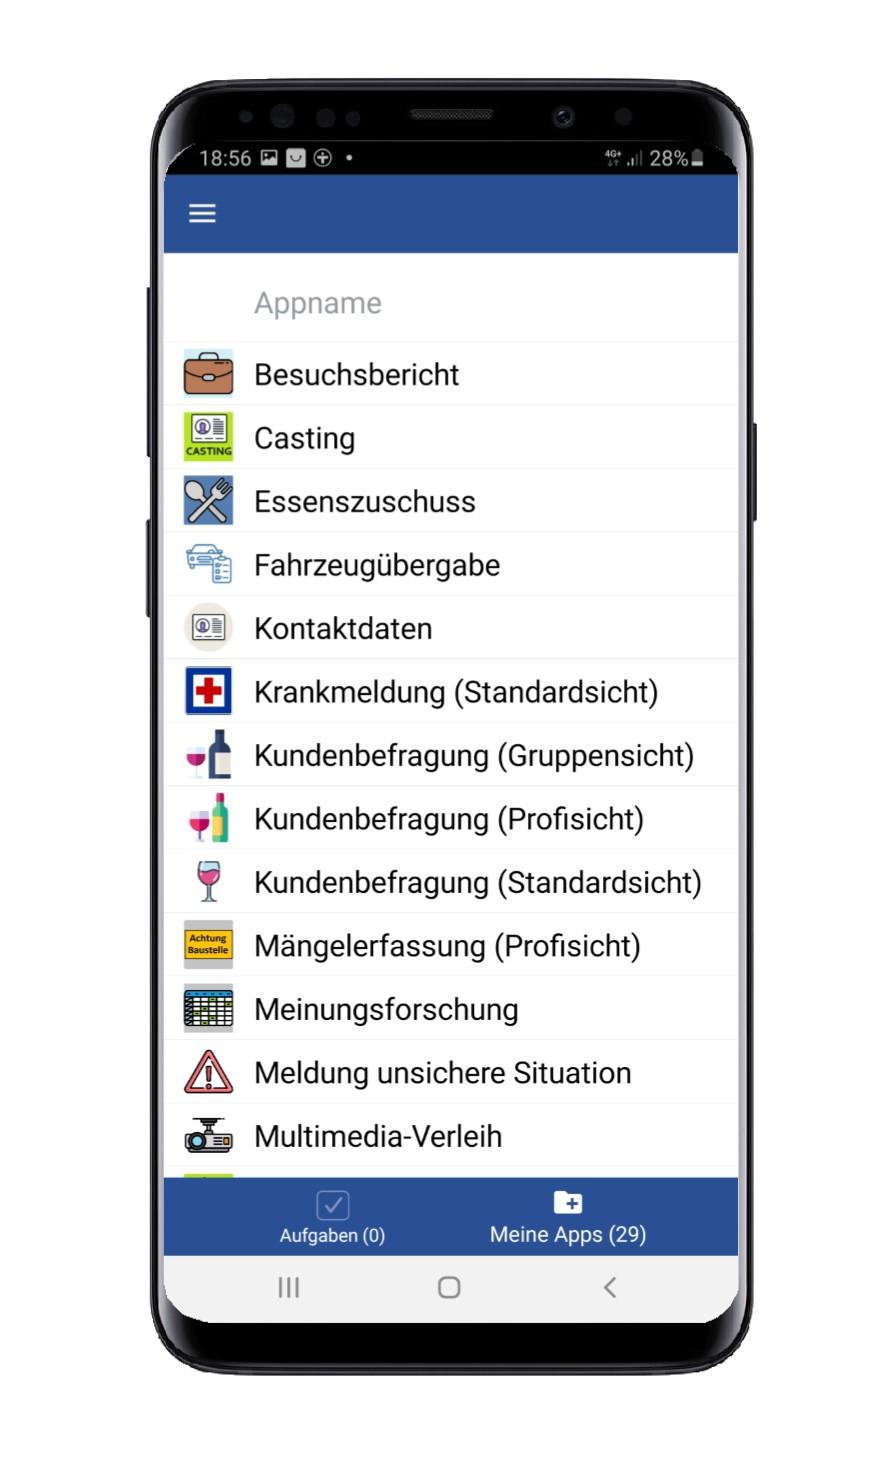 App-Liste